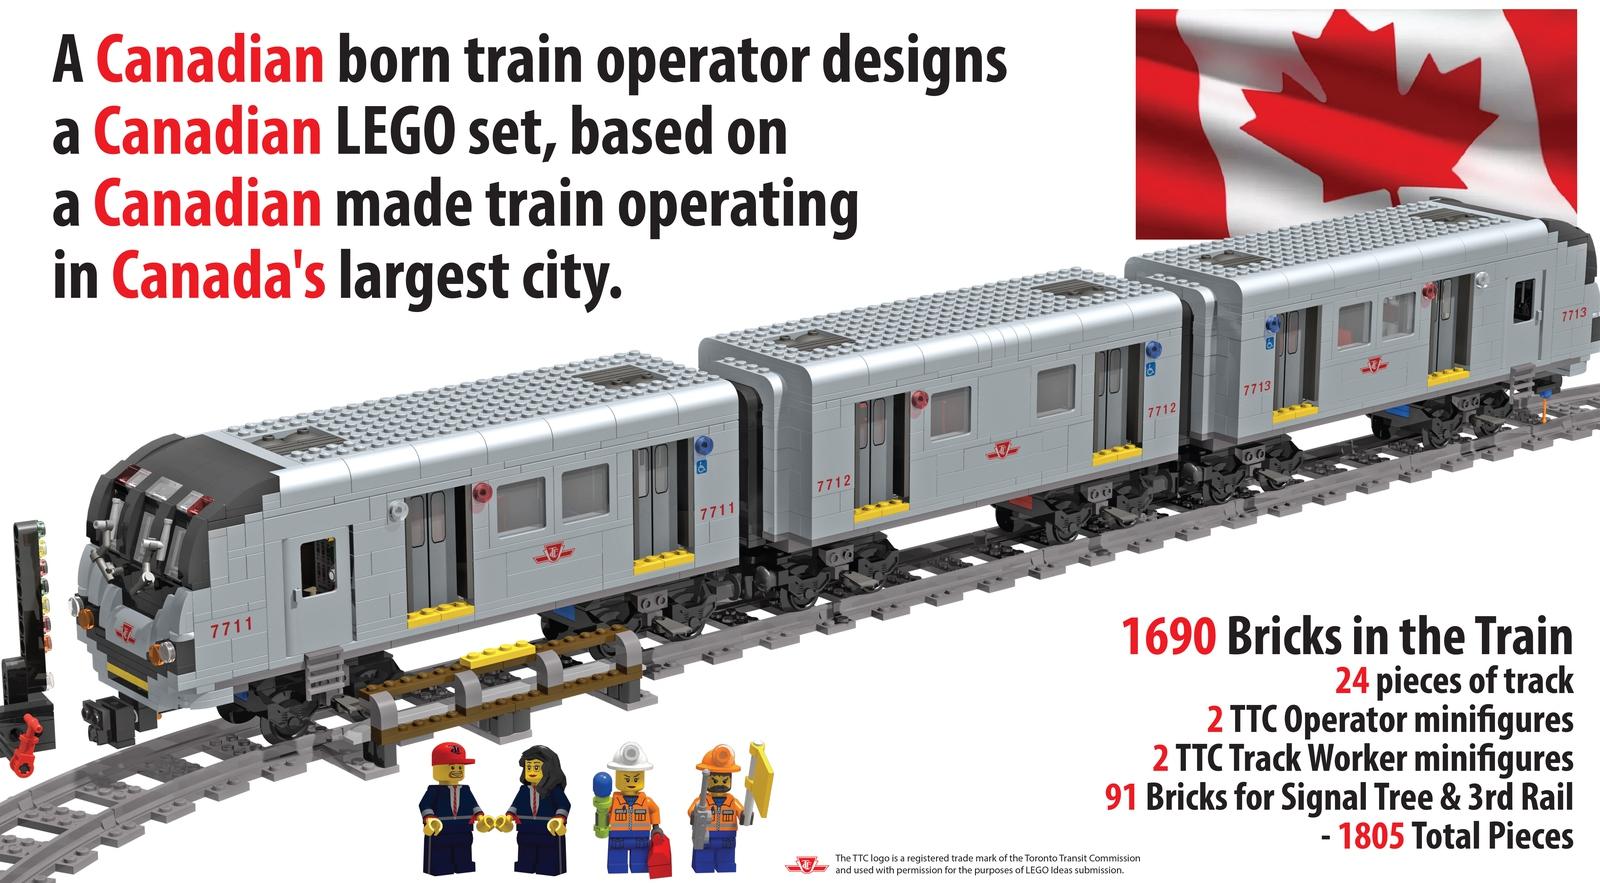 lego-ideas-toronto-rocket-subway-train-legovader217-2019-4 zusammengebaut.com